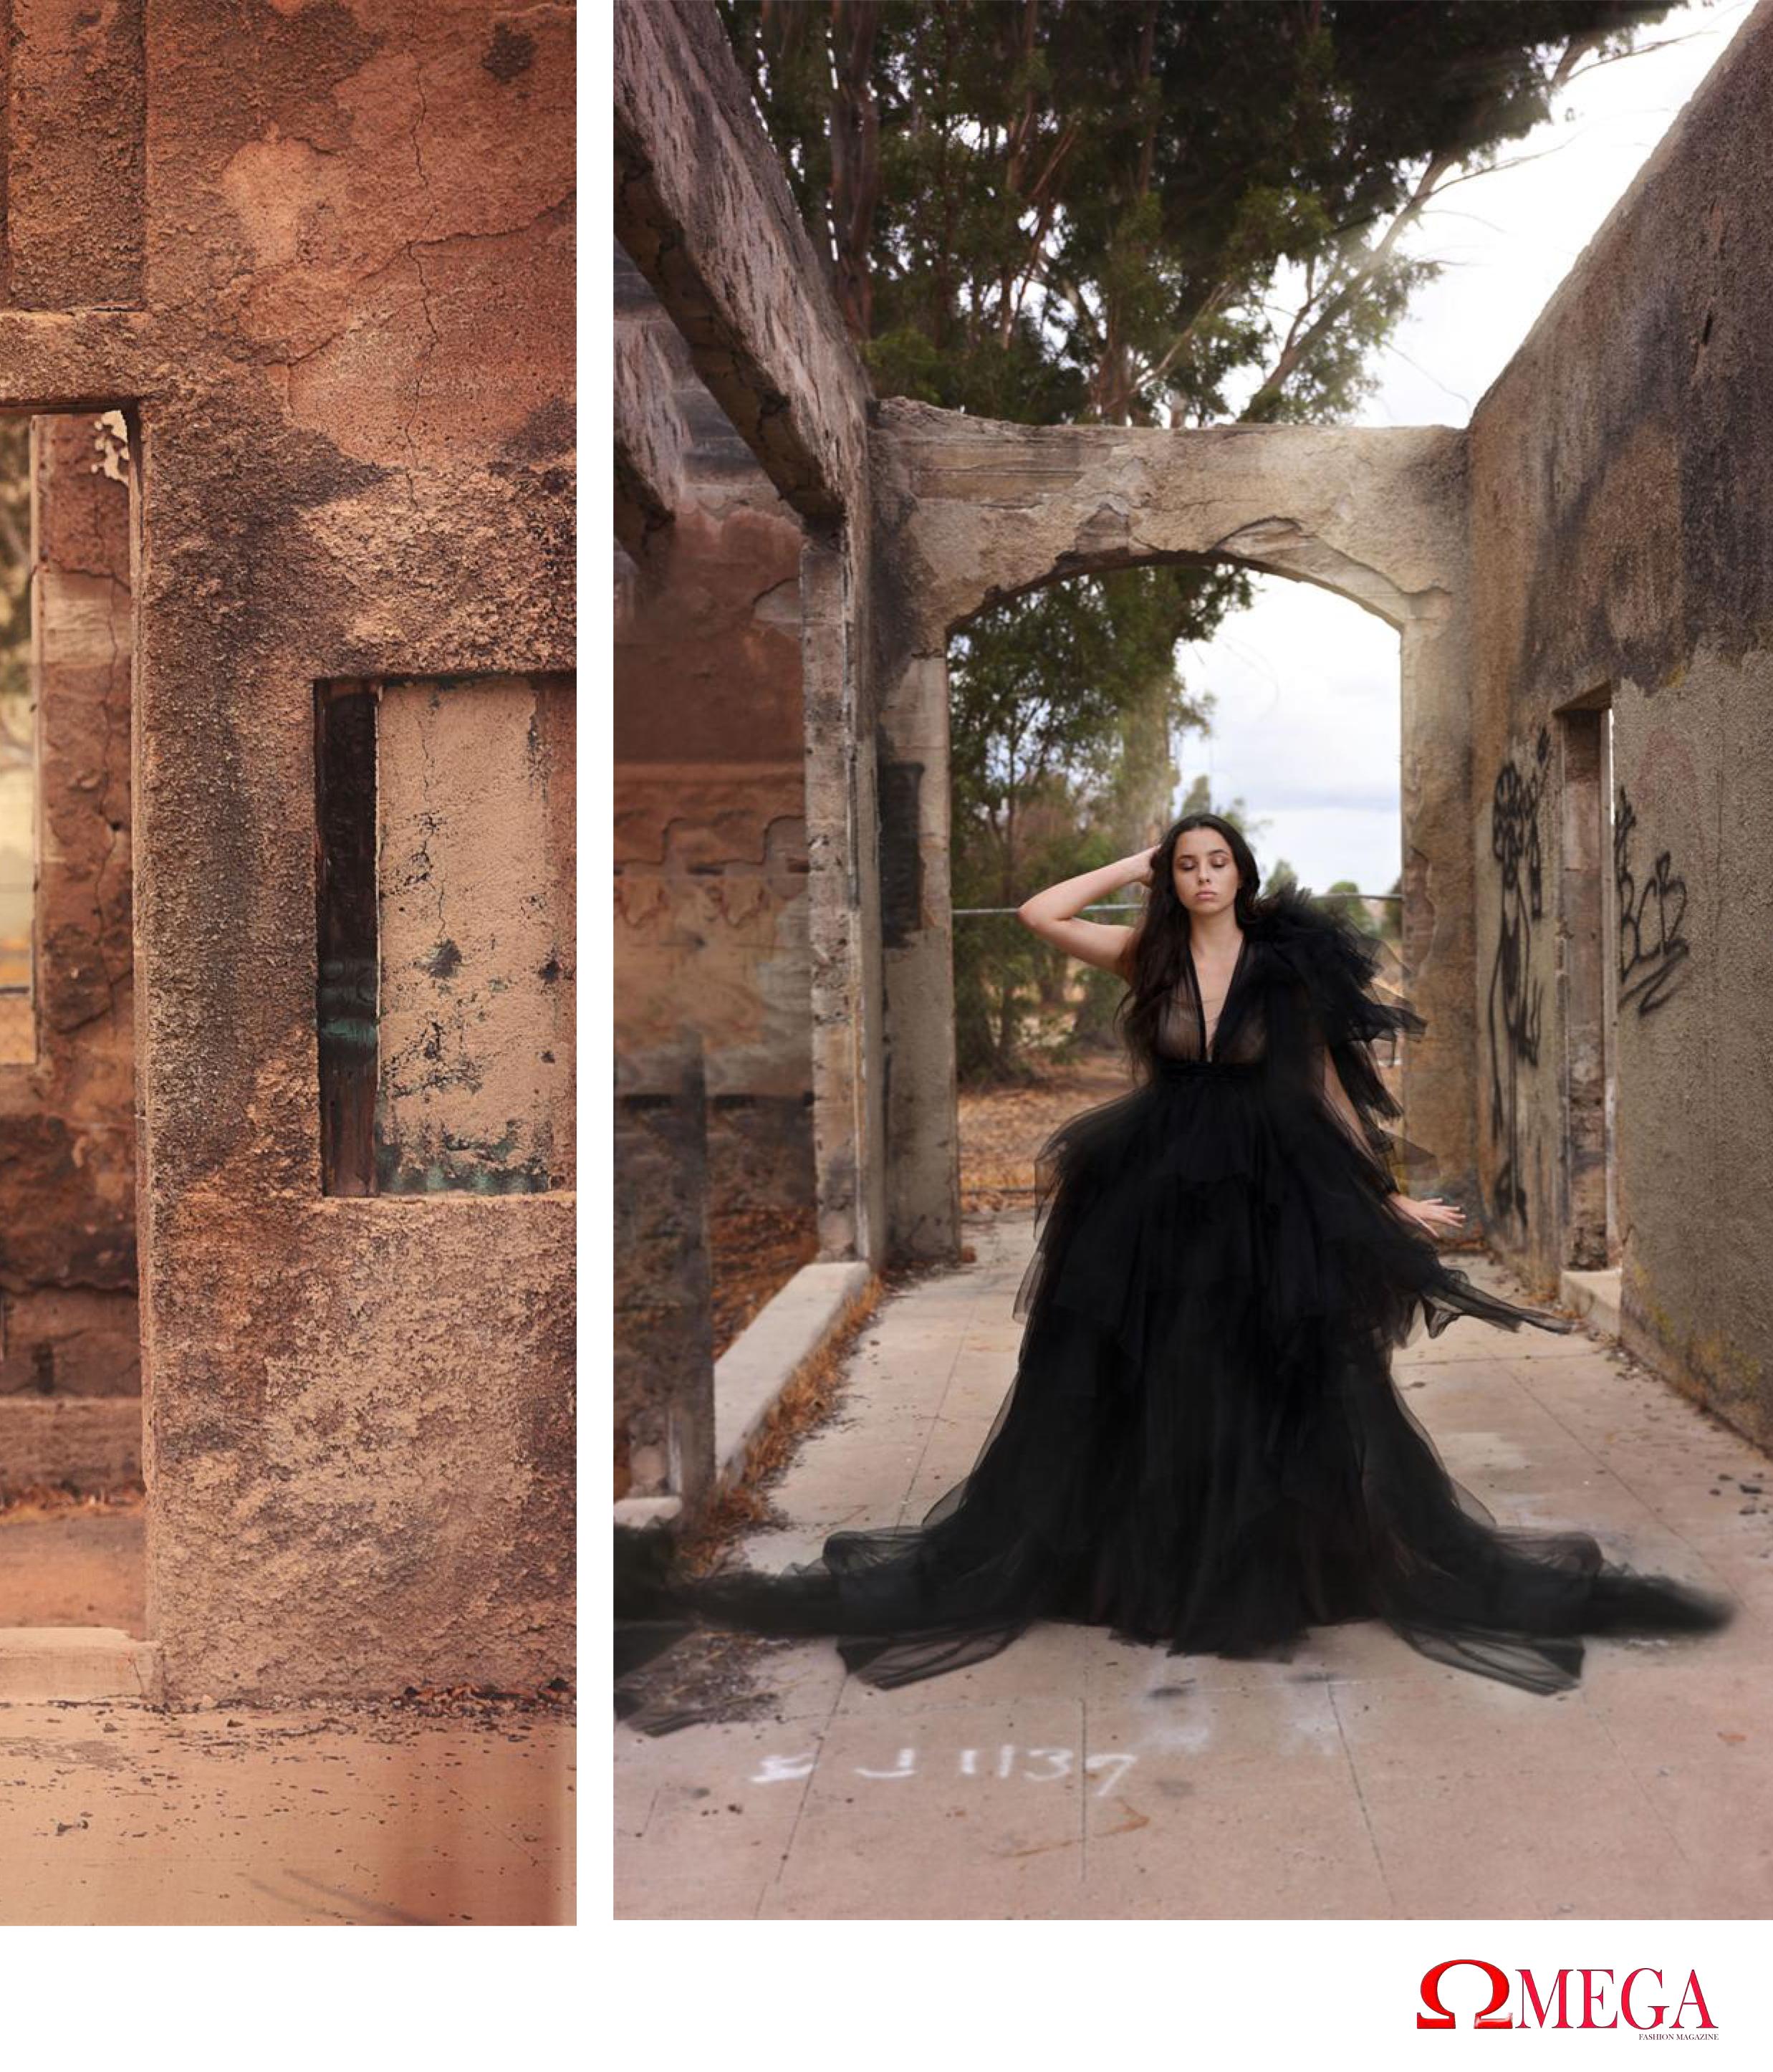 Omega_Fashion_Magazine_ 9 page 85.jpg